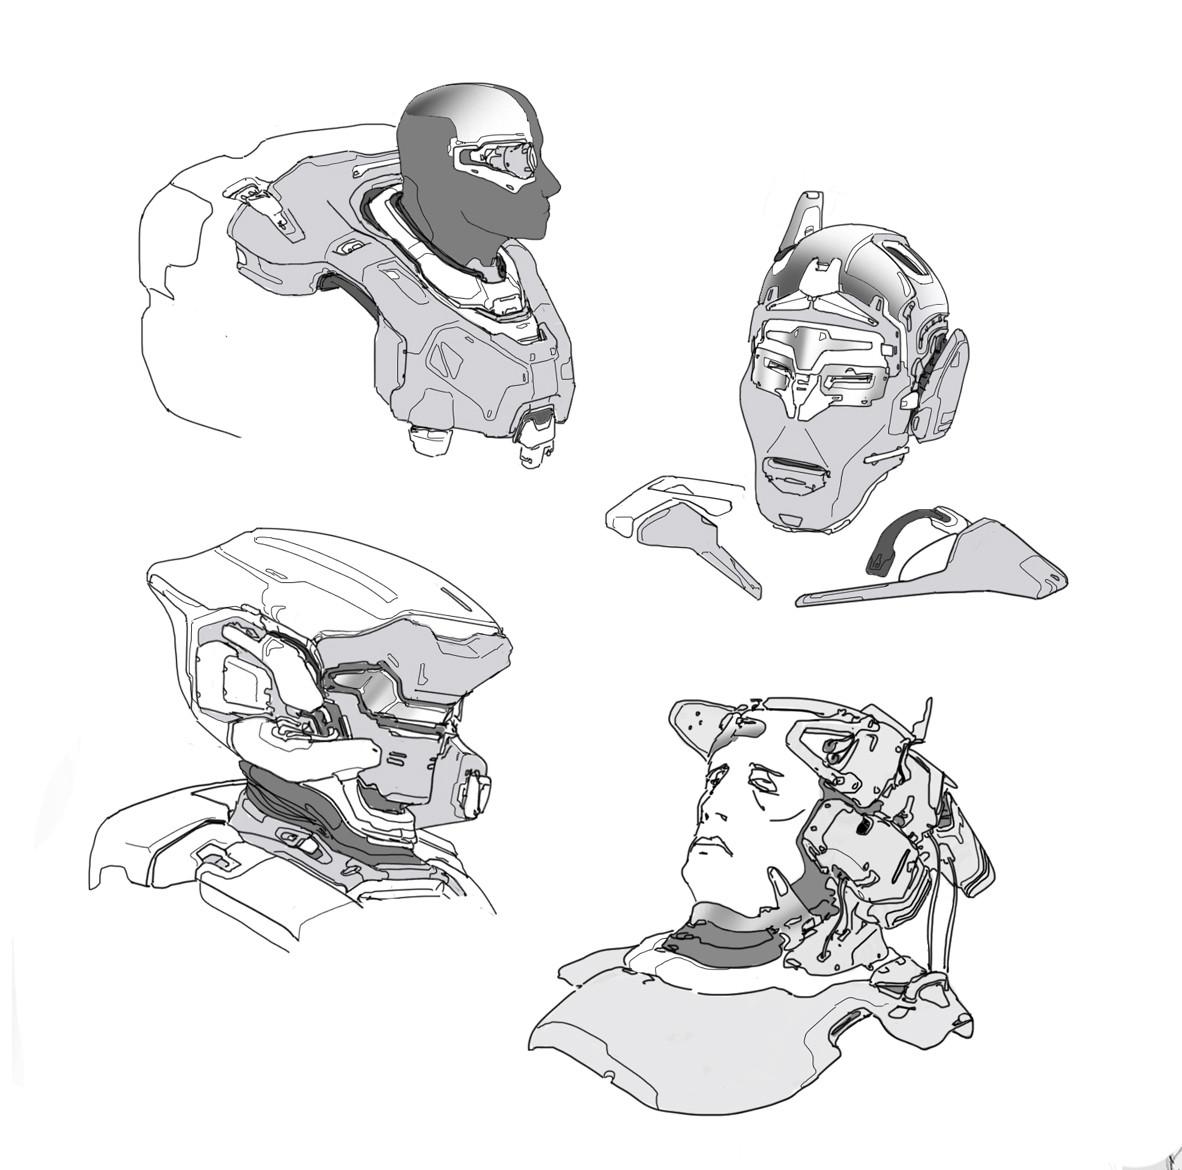 Random bust drawings